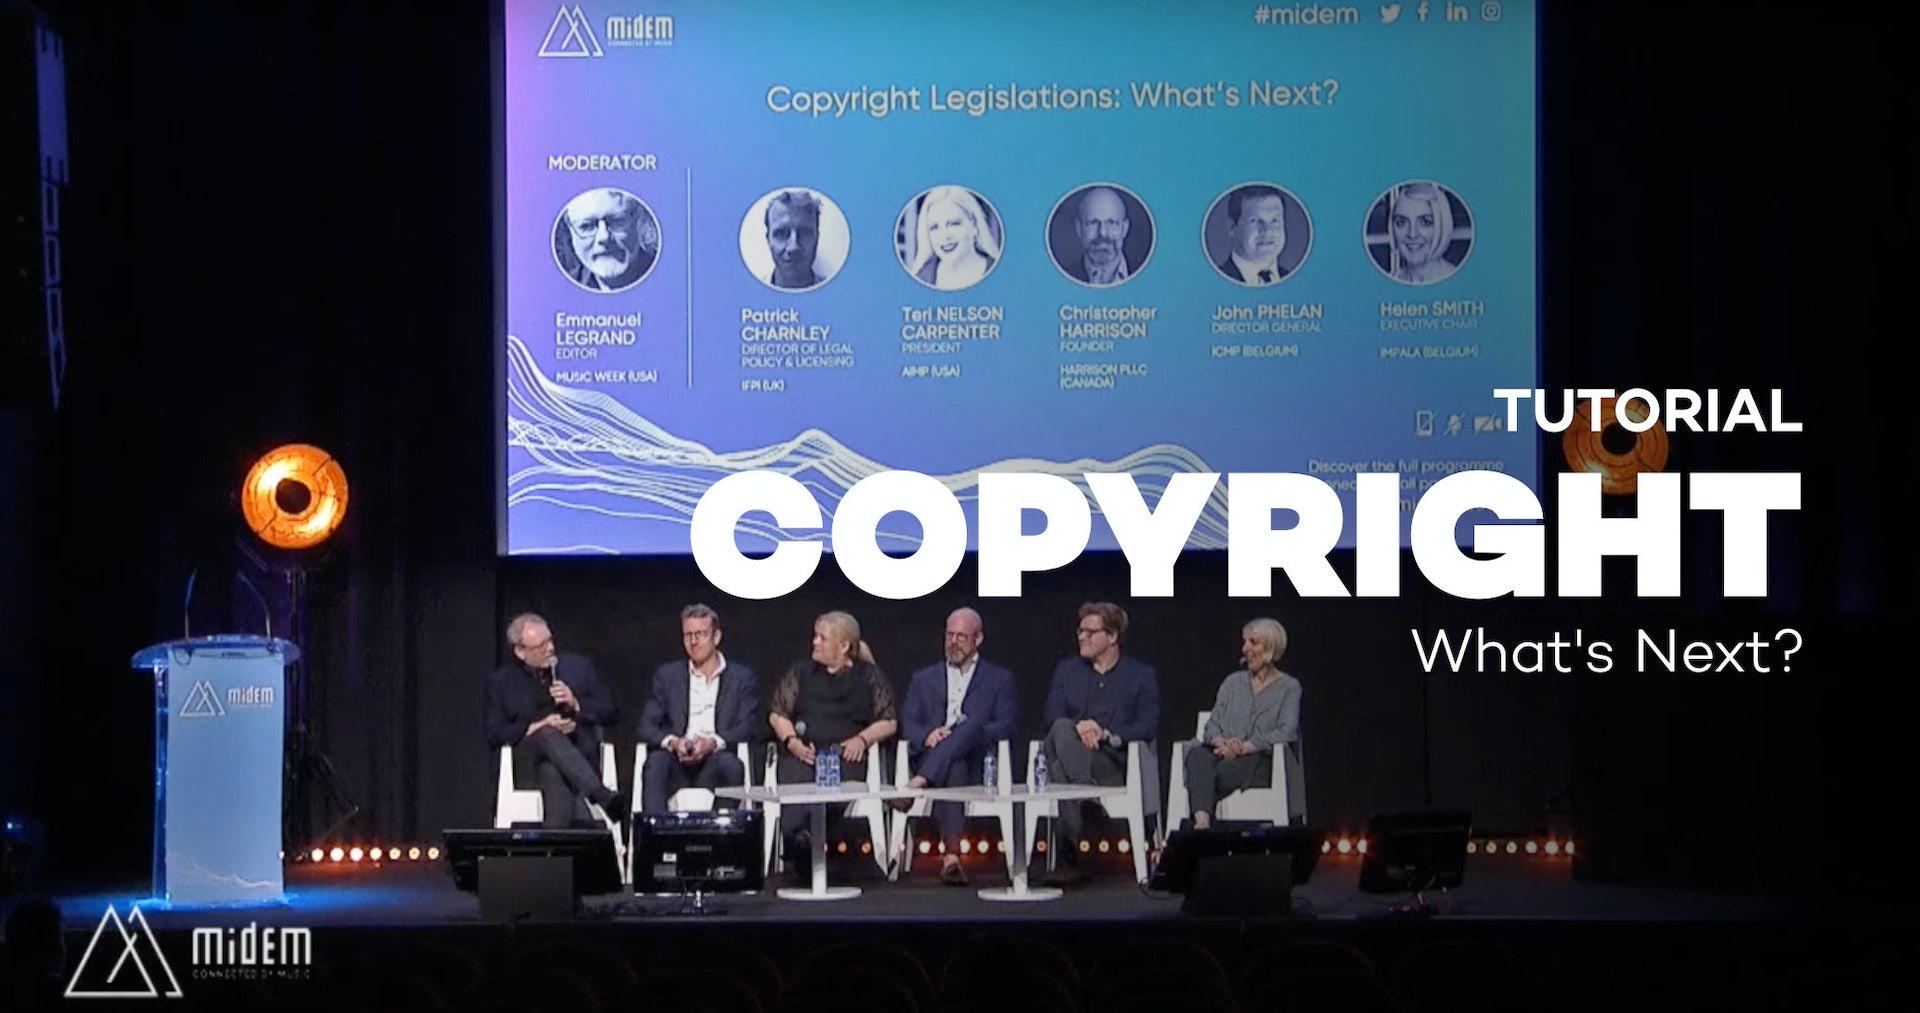 Copyright Legislations: What's Next? - Midem 2019